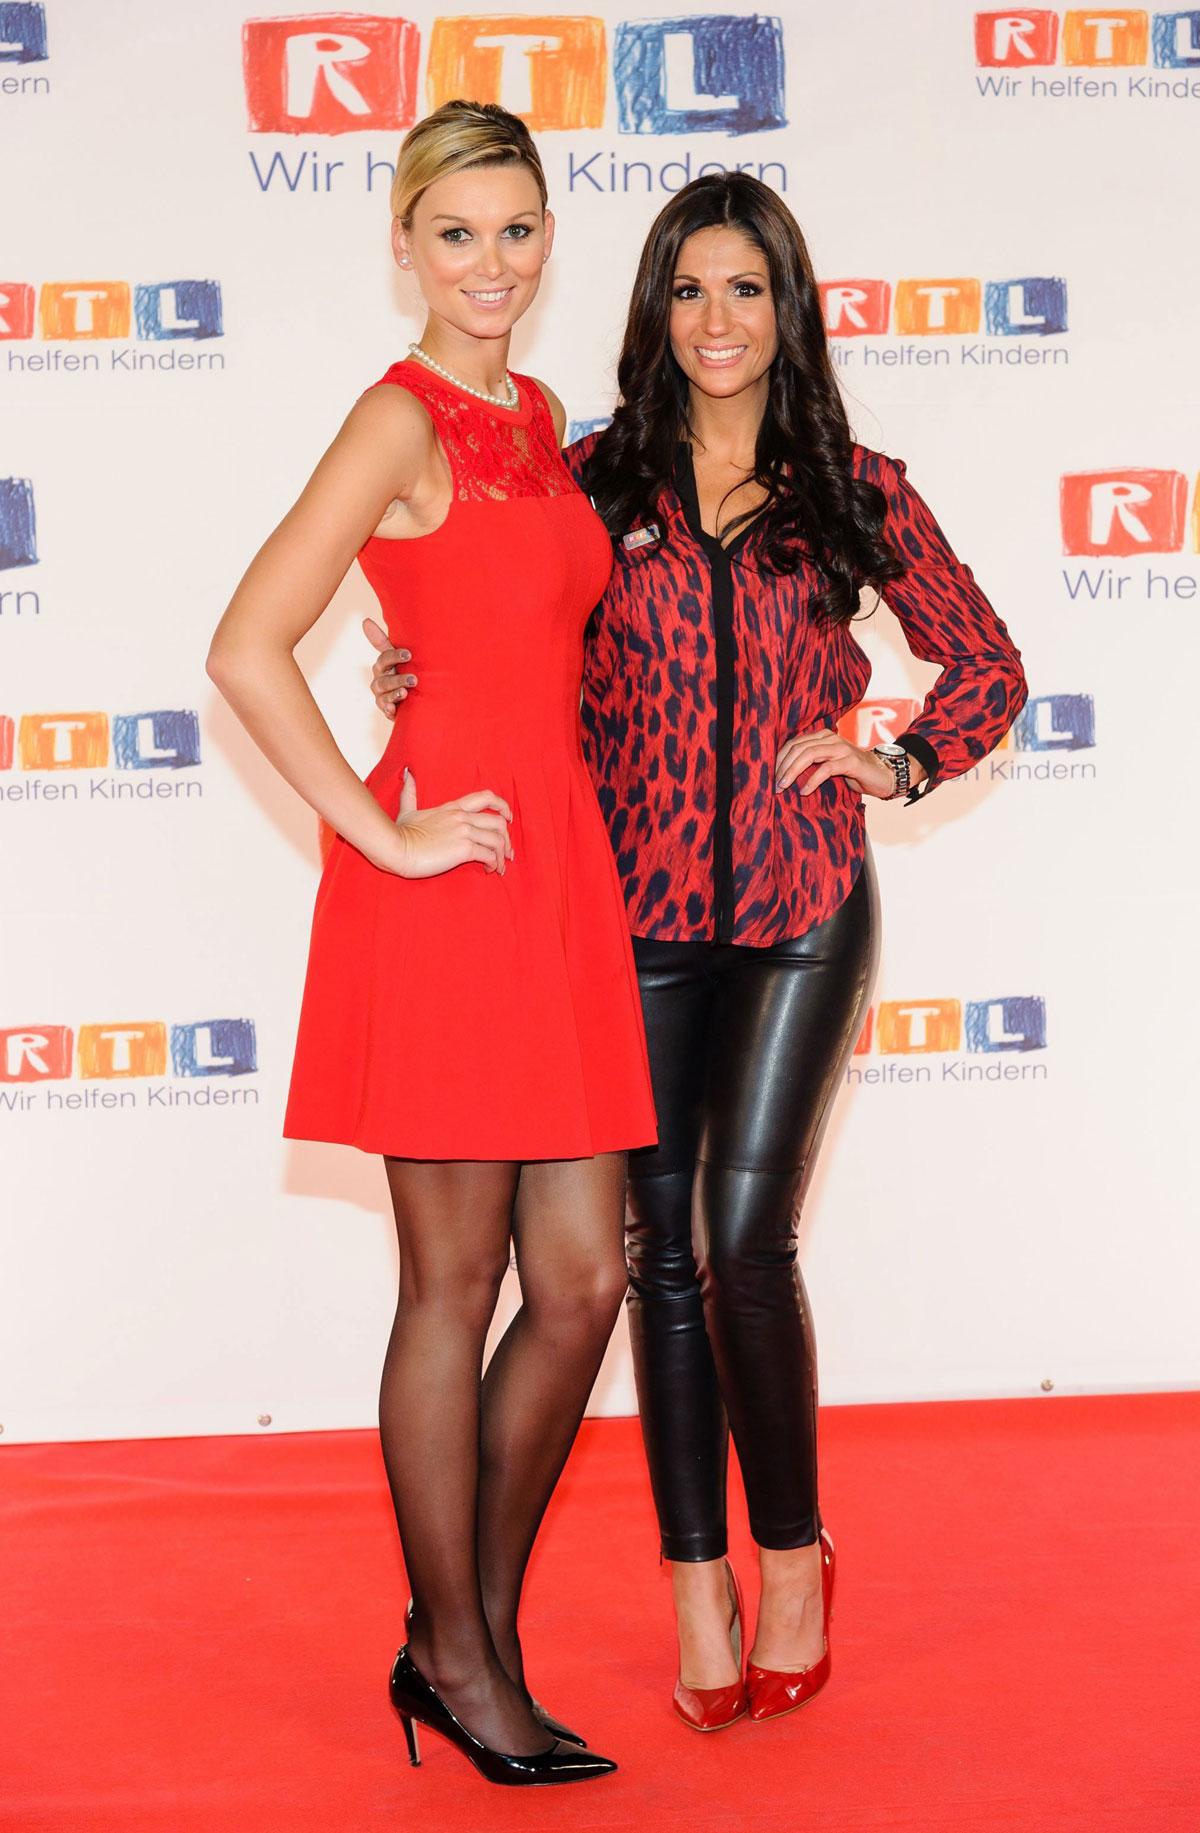 Anja Polzer attends RTL Spendenmarathon